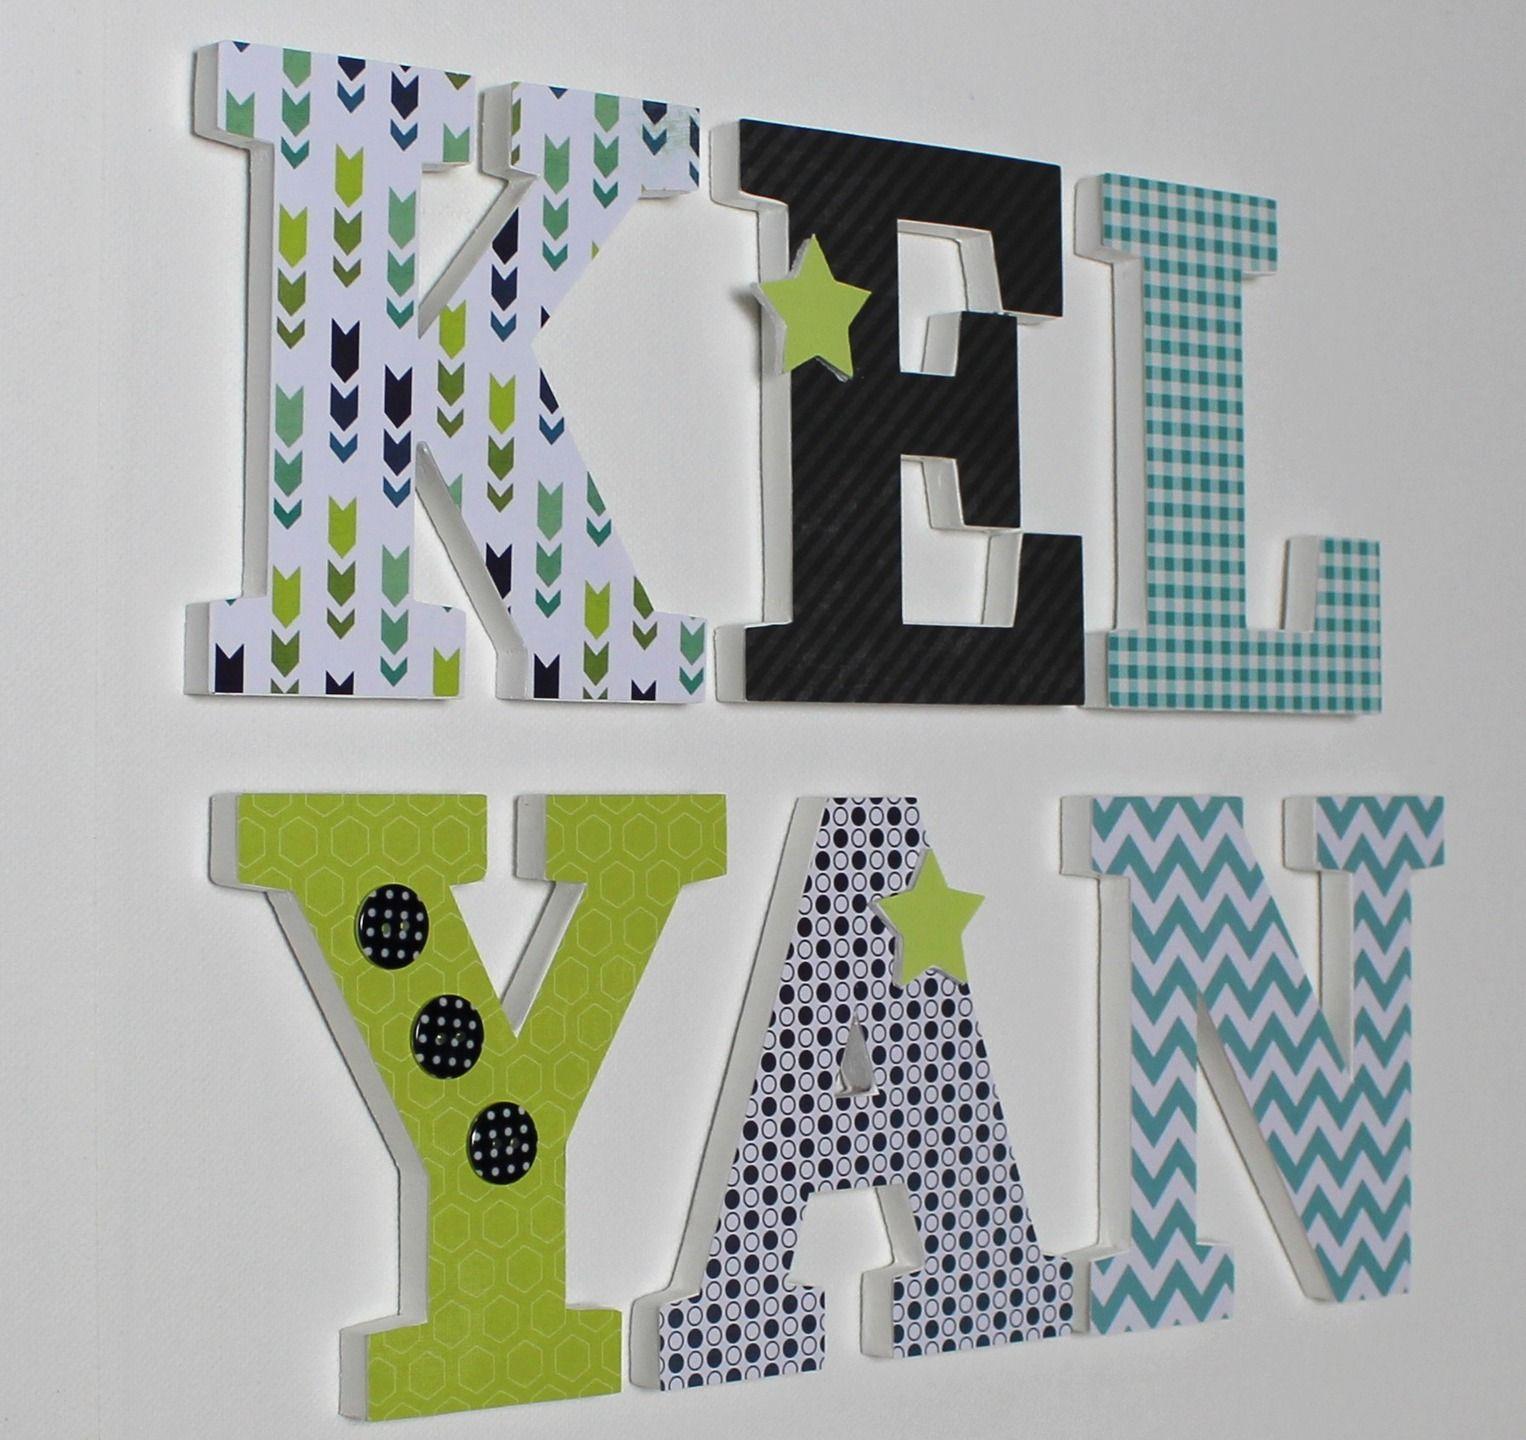 Lettres En Bois Prenom Kelyan Bleu Vert Gris Style Scandinave